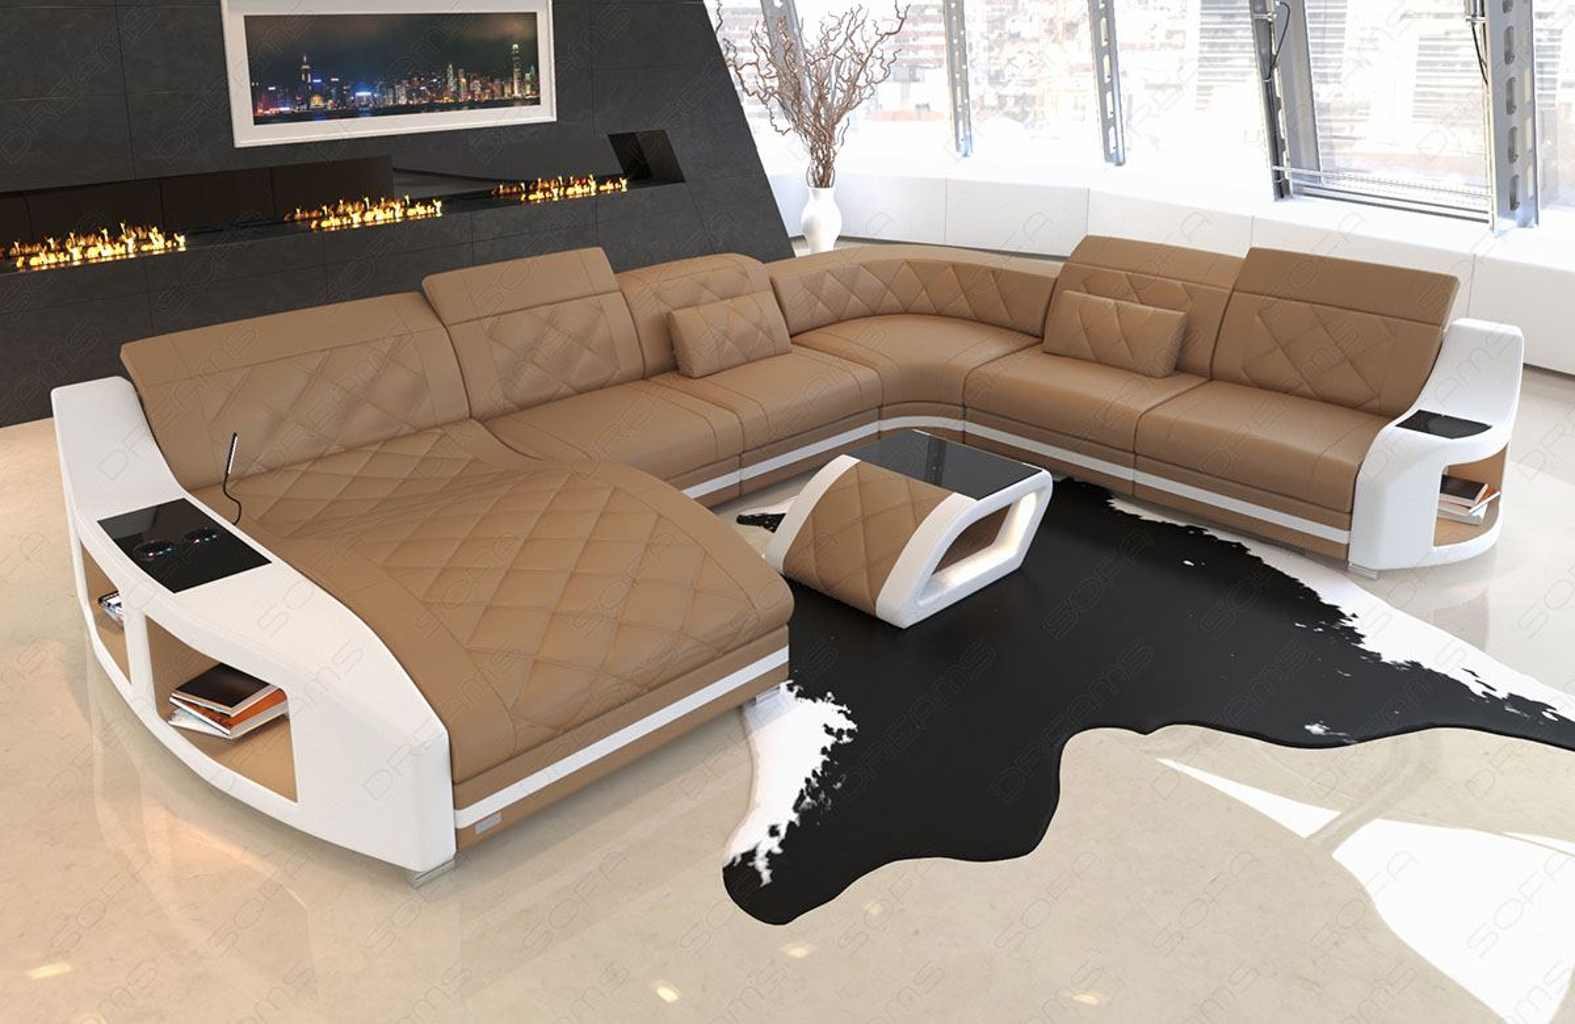 Sofa Couch Wohnlandschaft Swing Xxl Designer Couch Ottomane Led